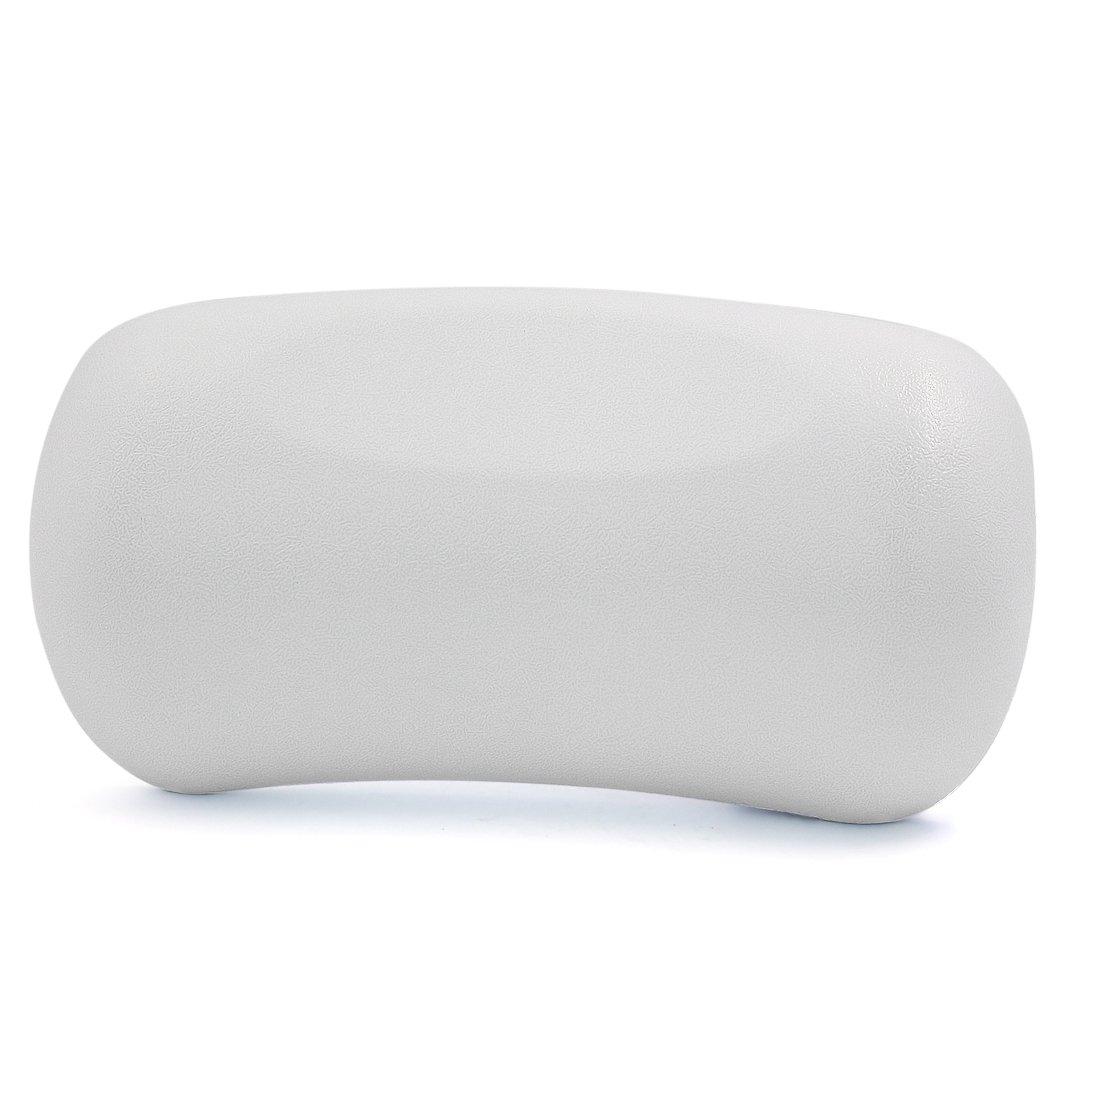 White Neck Back Support Headrest Comfort Bathtub Tub Bath Spa Pillow Cushion